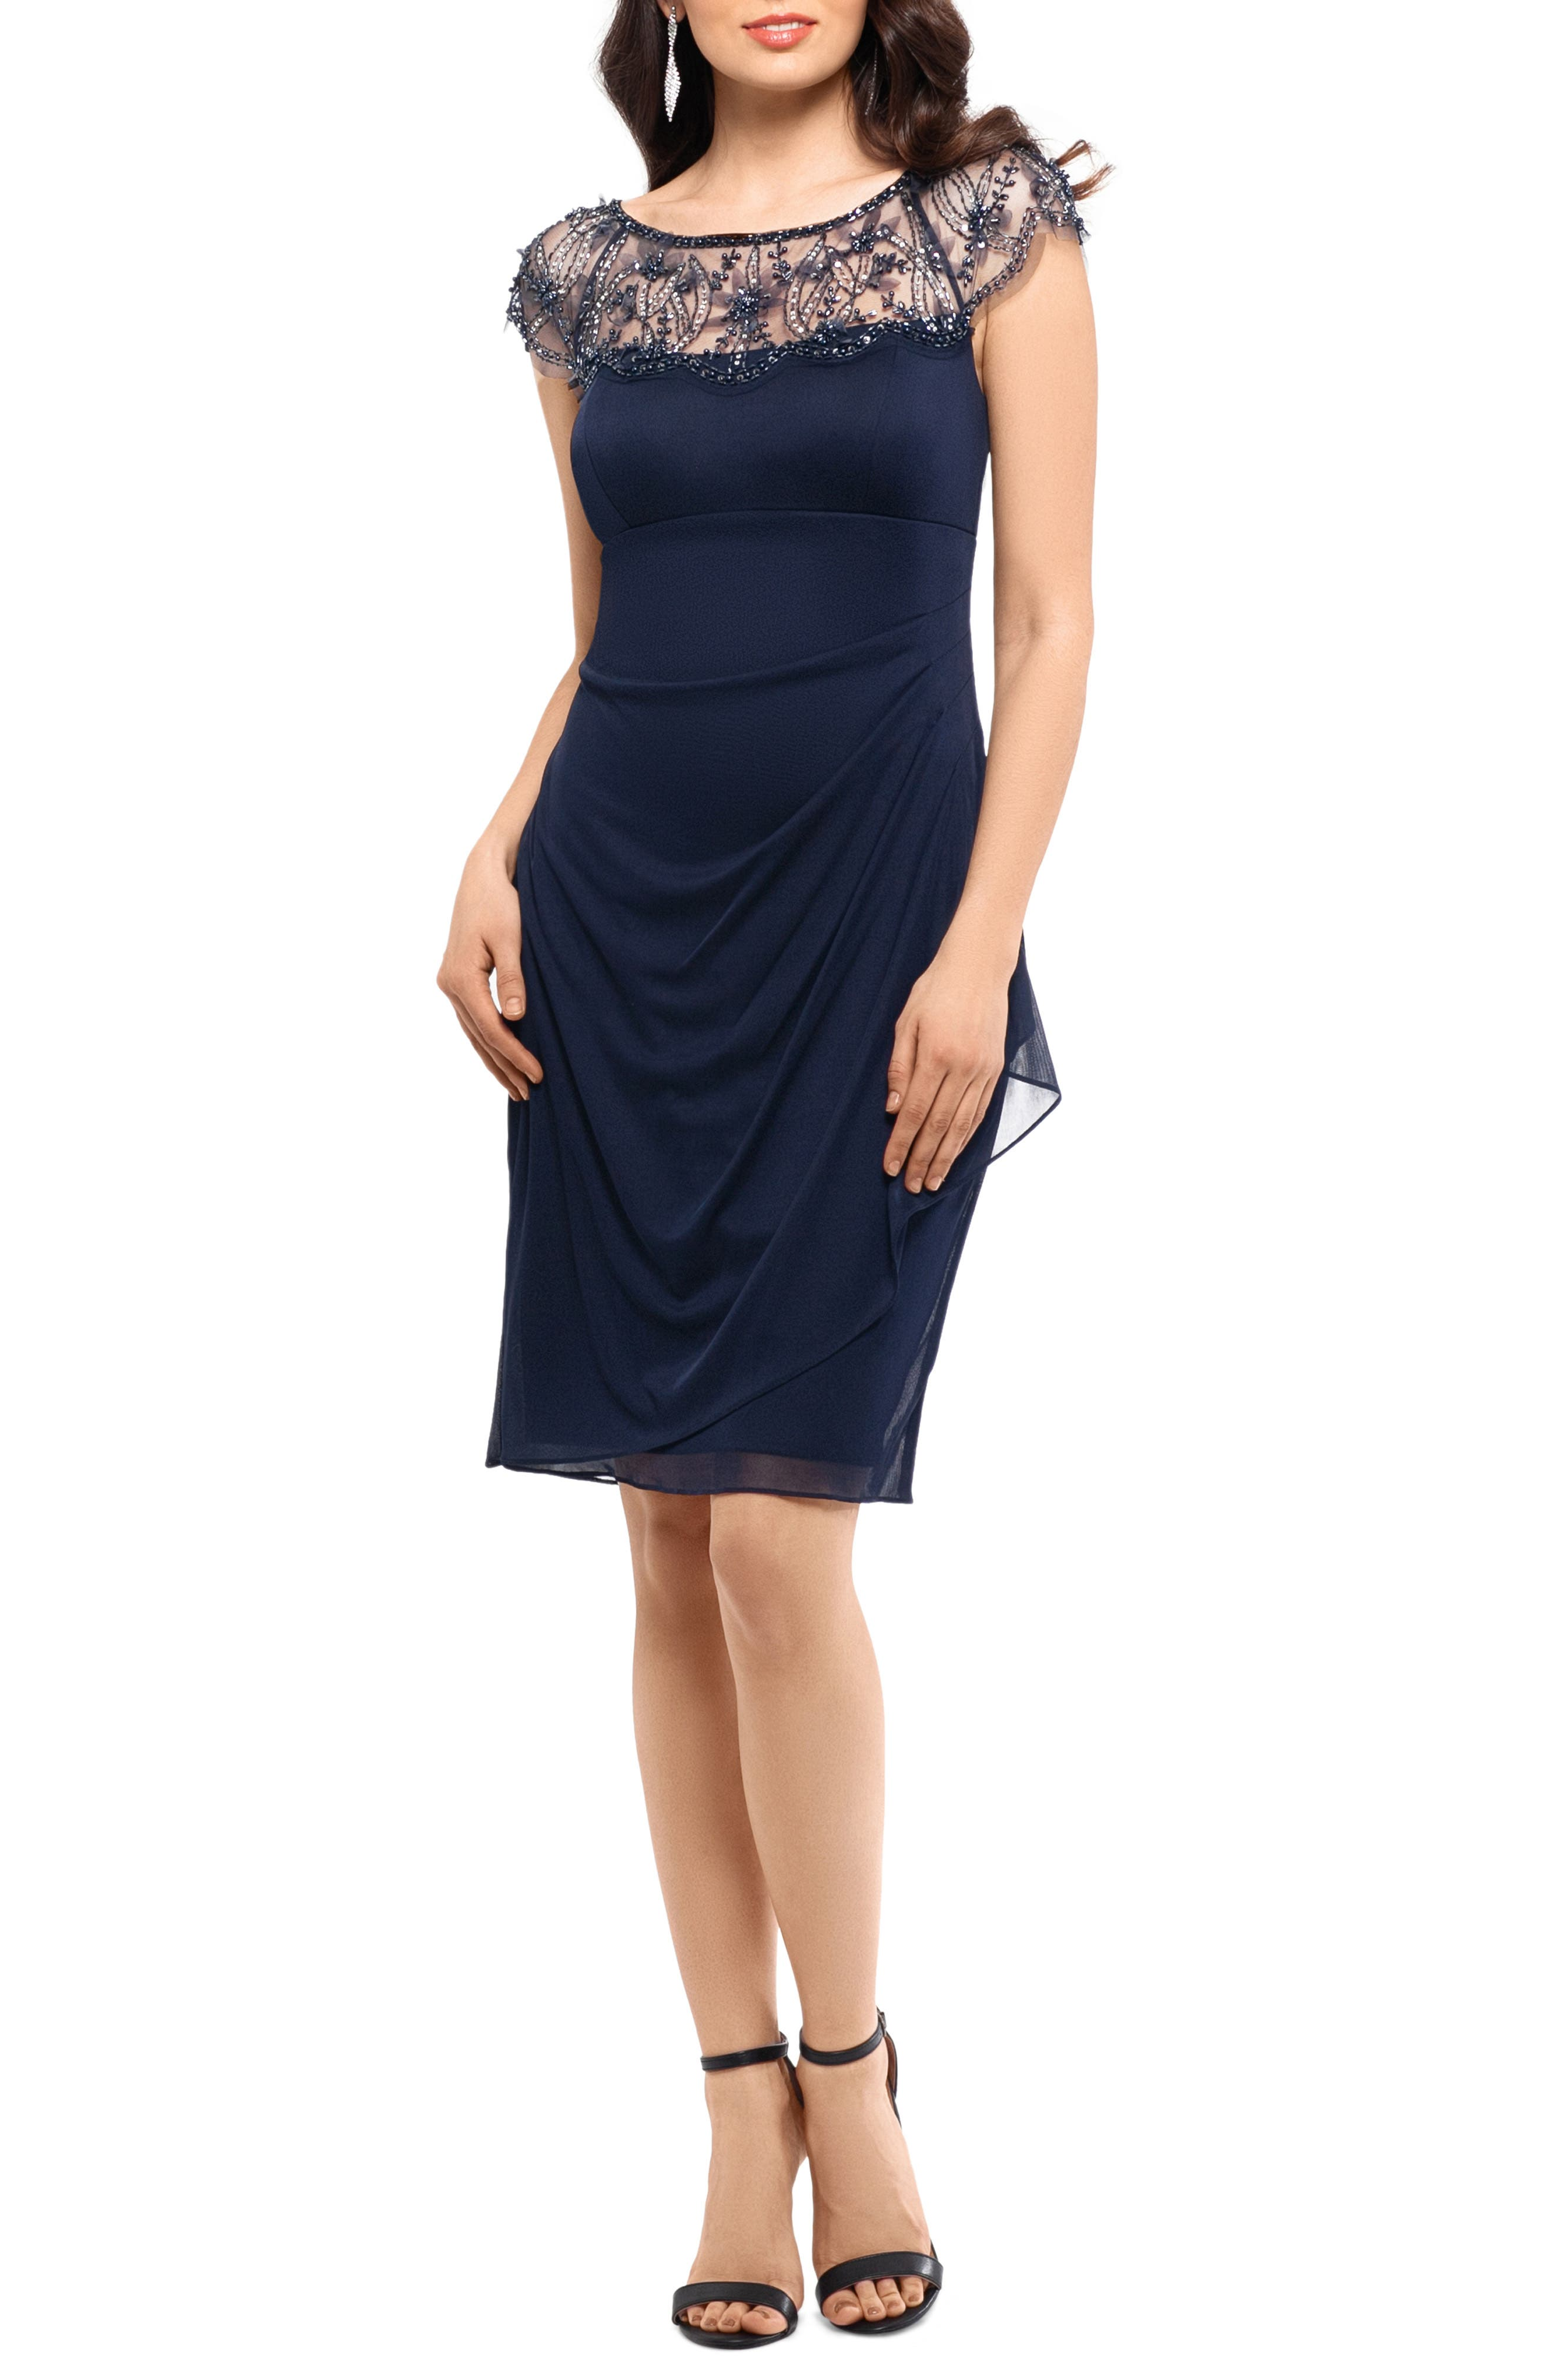 Xscape Beaded Illusion Lace Detail Cocktail Dress, Blue